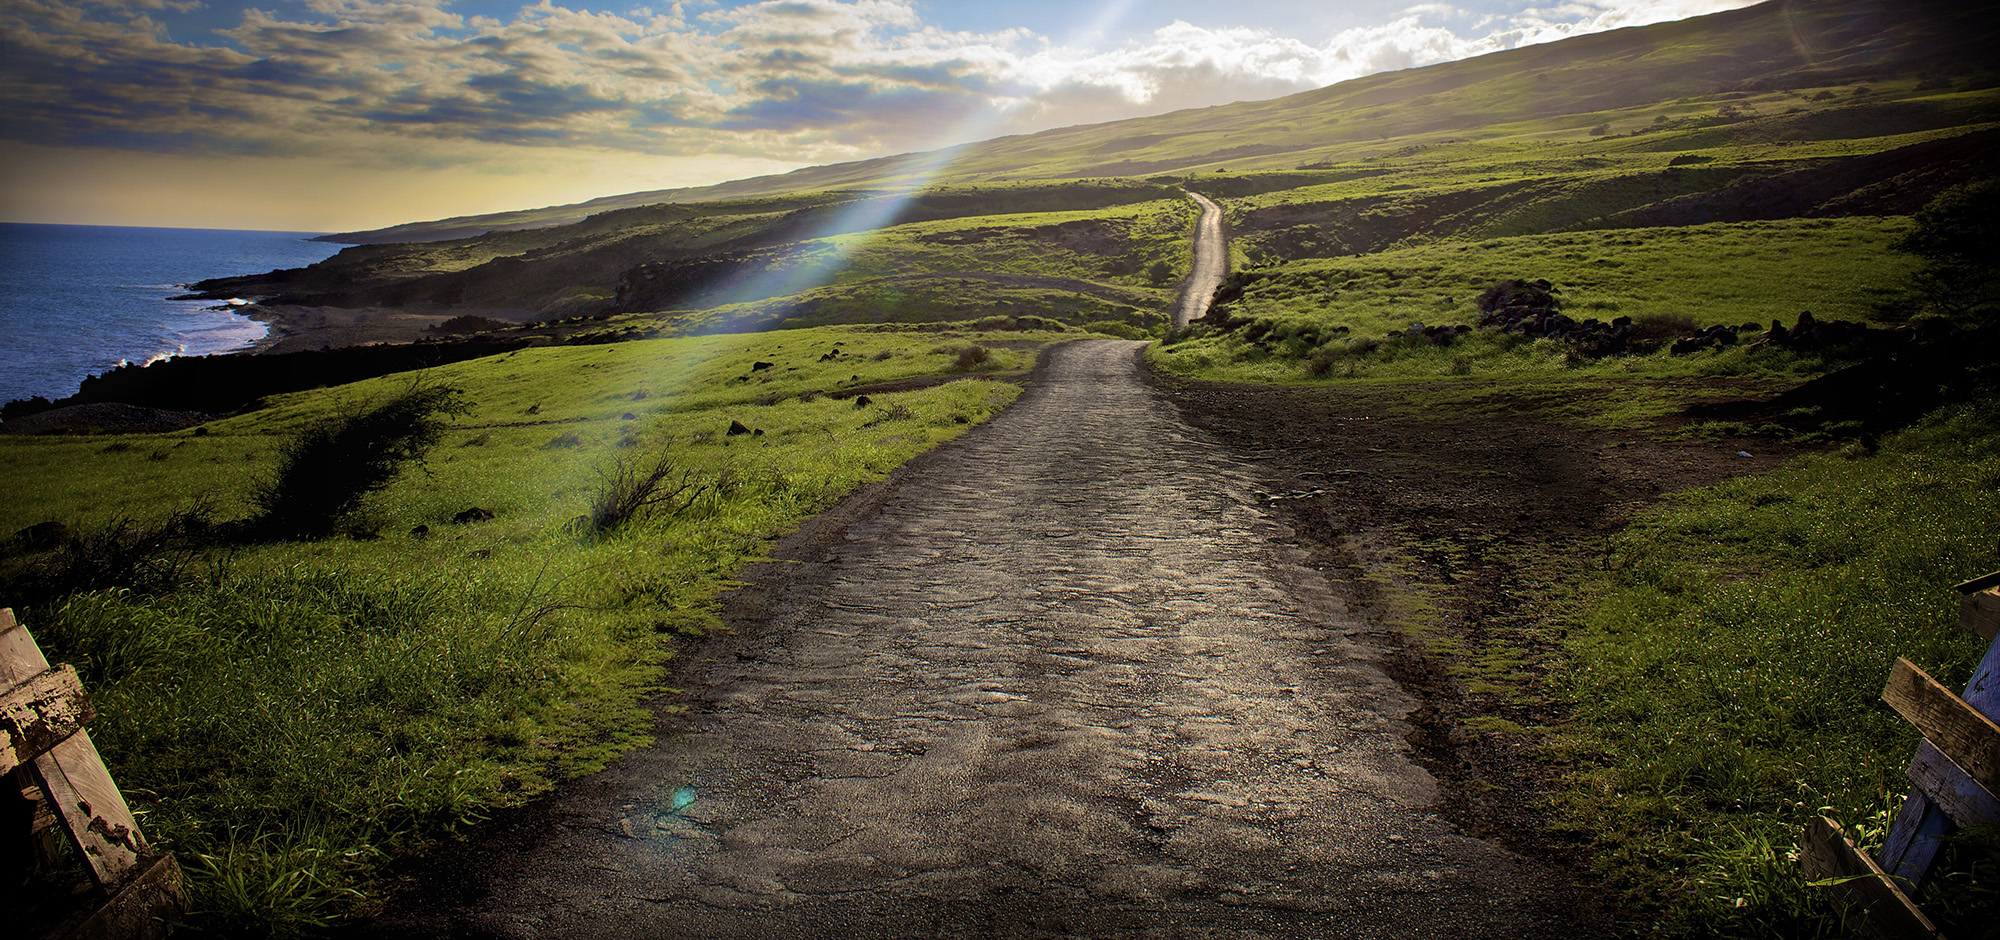 Take the Hard Road